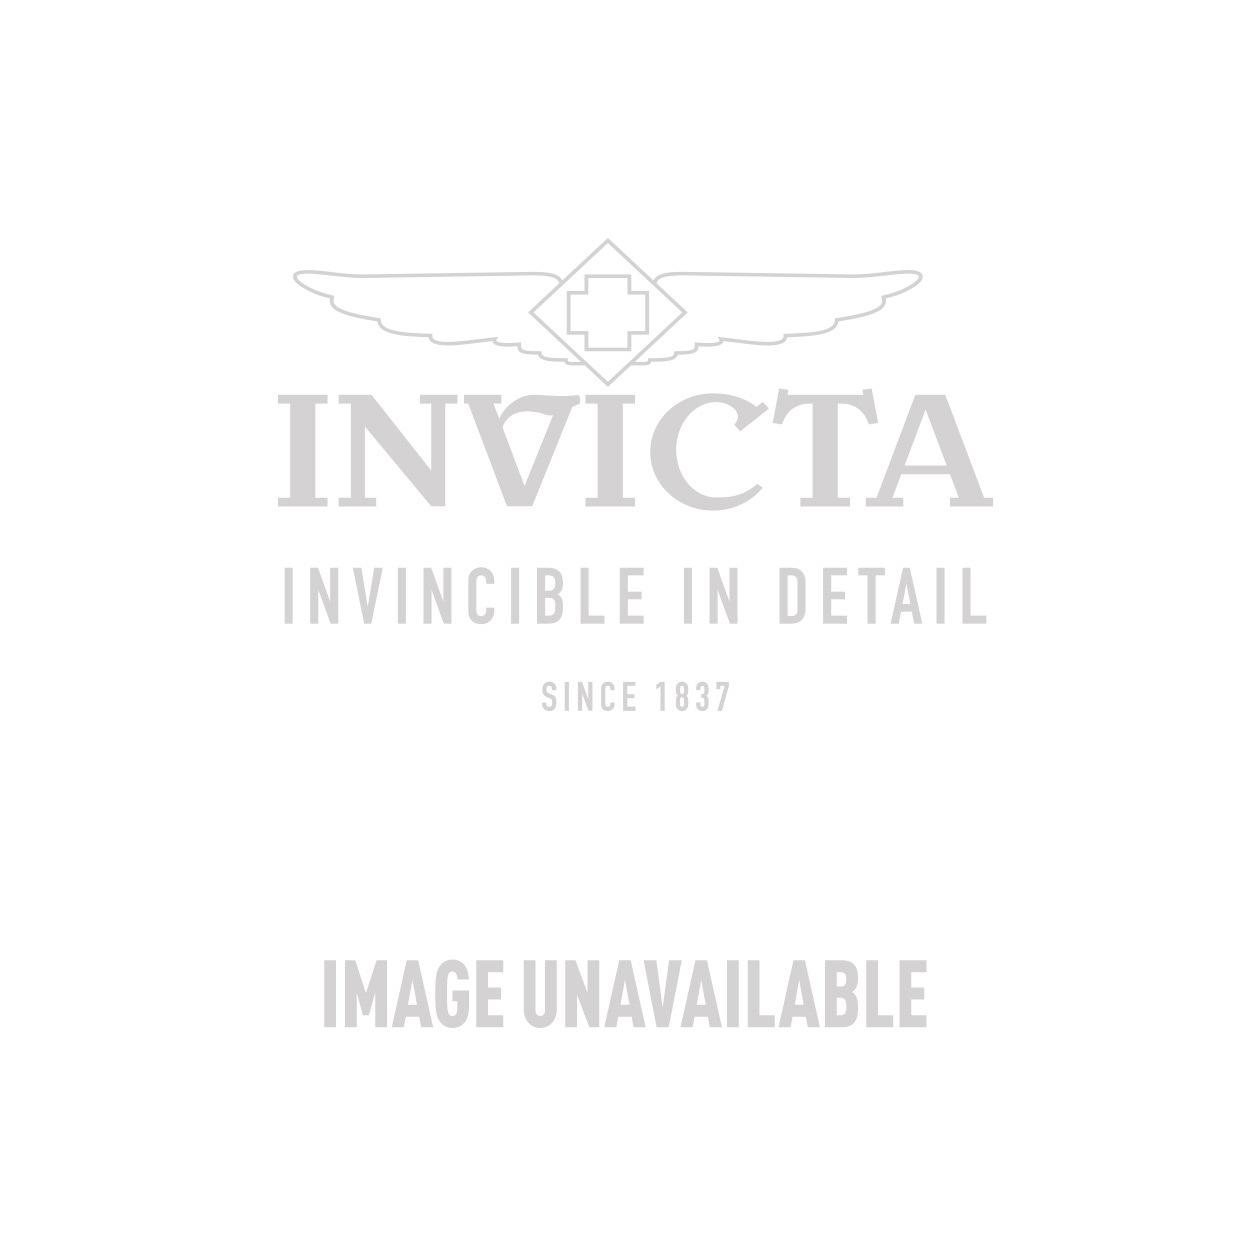 Invicta Venom Swiss Made Quartz Watch - Gunmetal, Stainless Steel case with Black, Yellow tone Silicone band - Model 16996